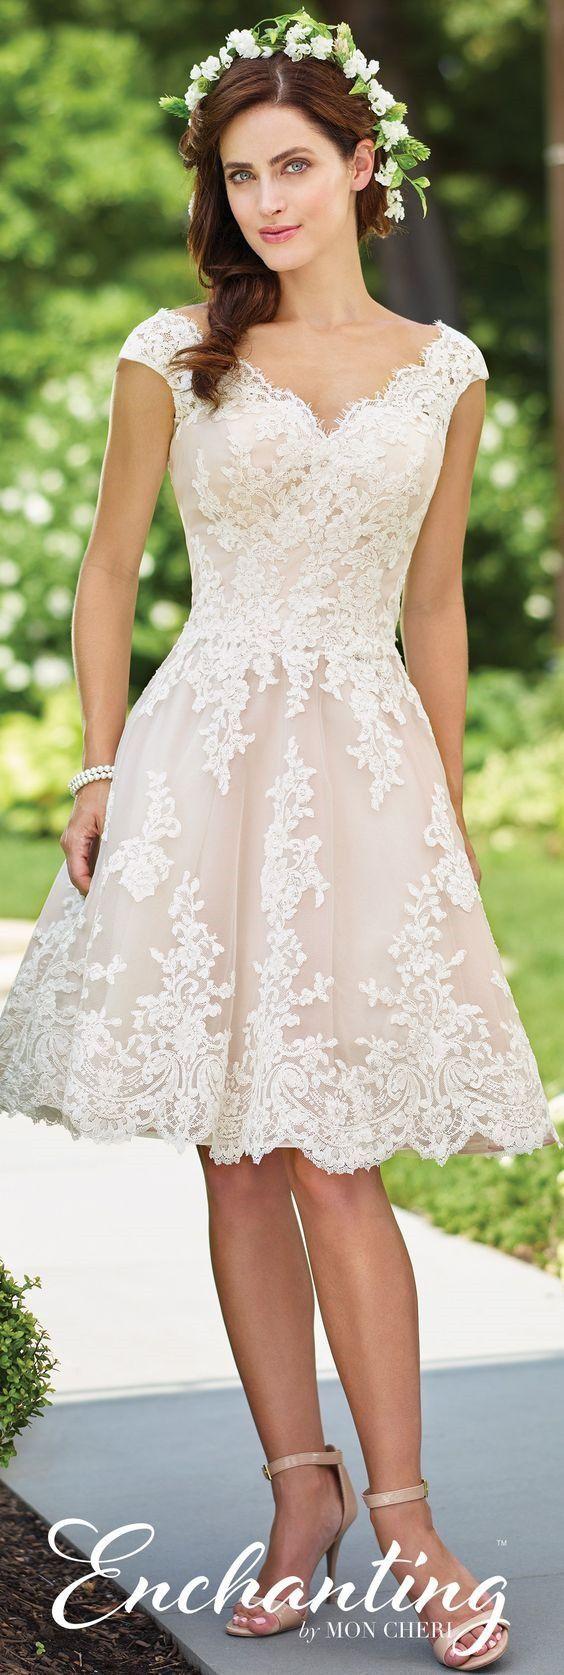 20+ Flattering Tea Length Wedding Dresses